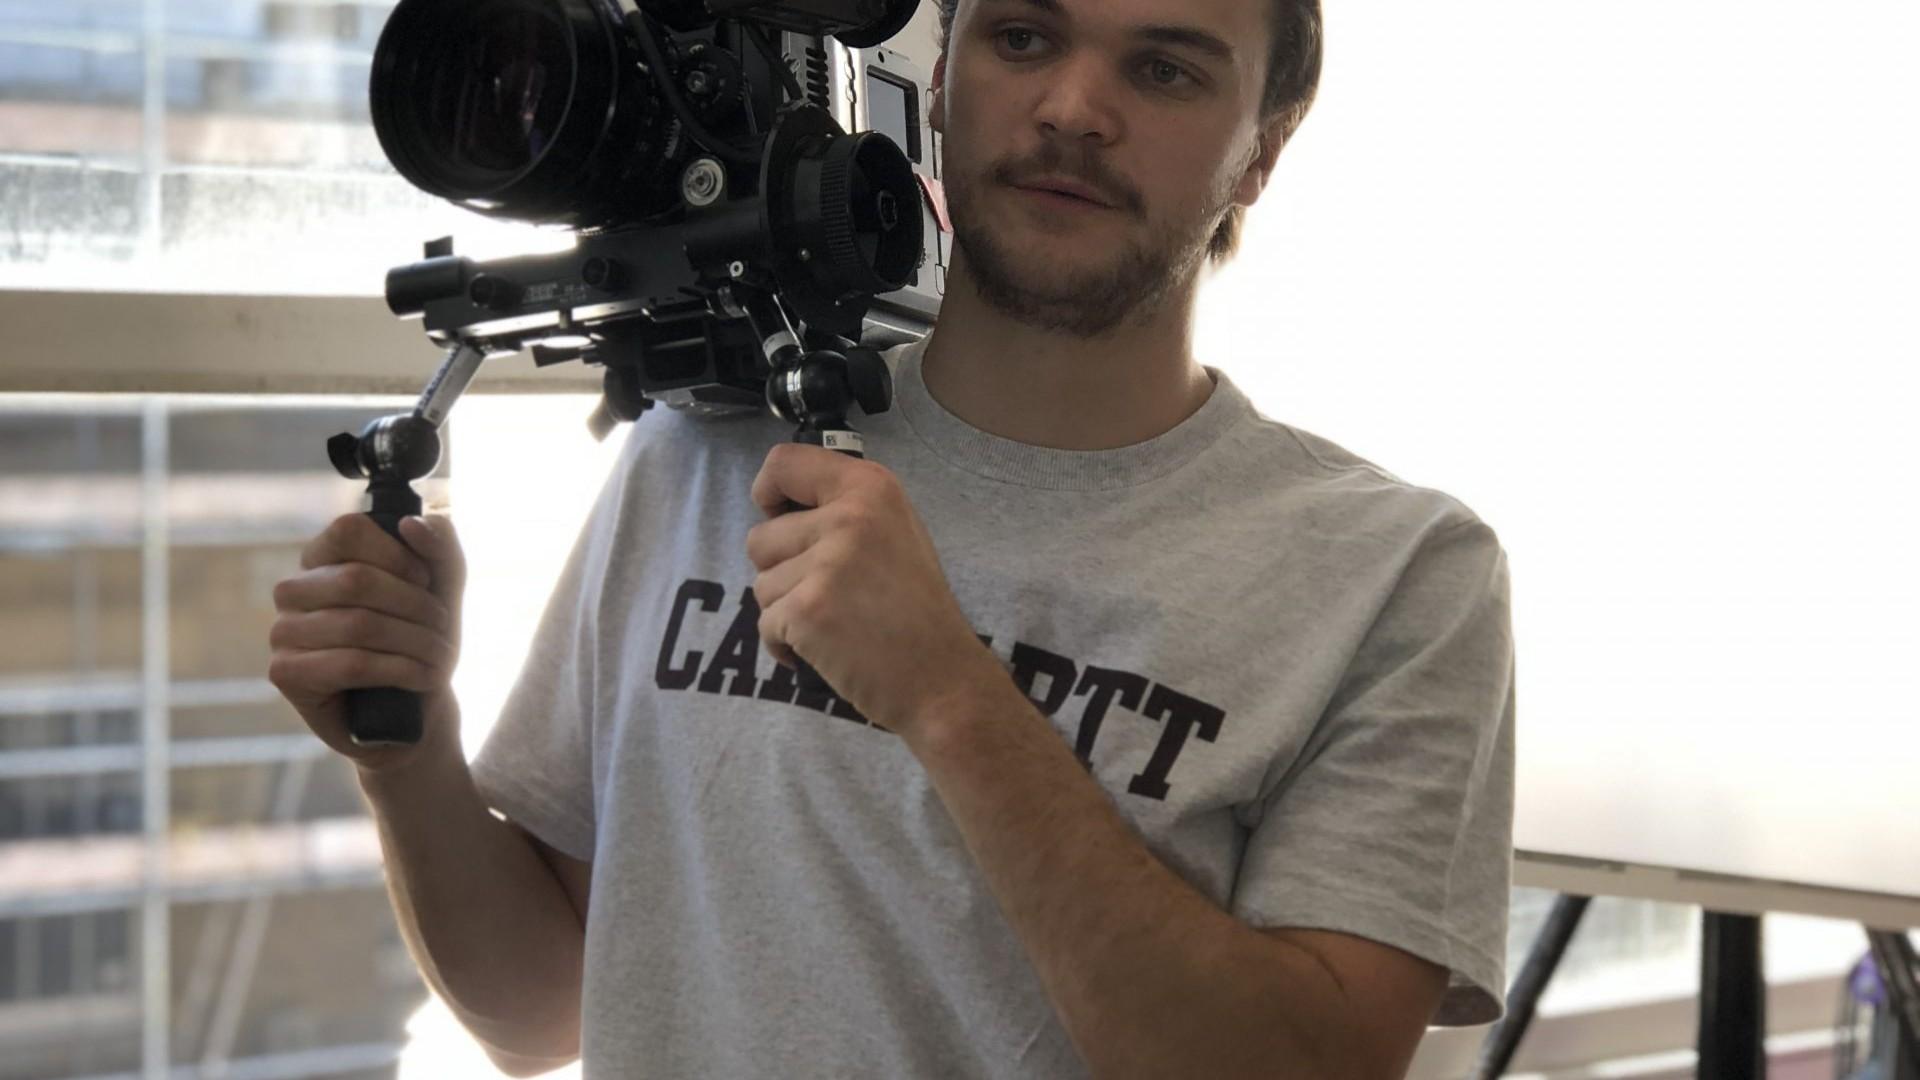 Habitual Media - person holding camera